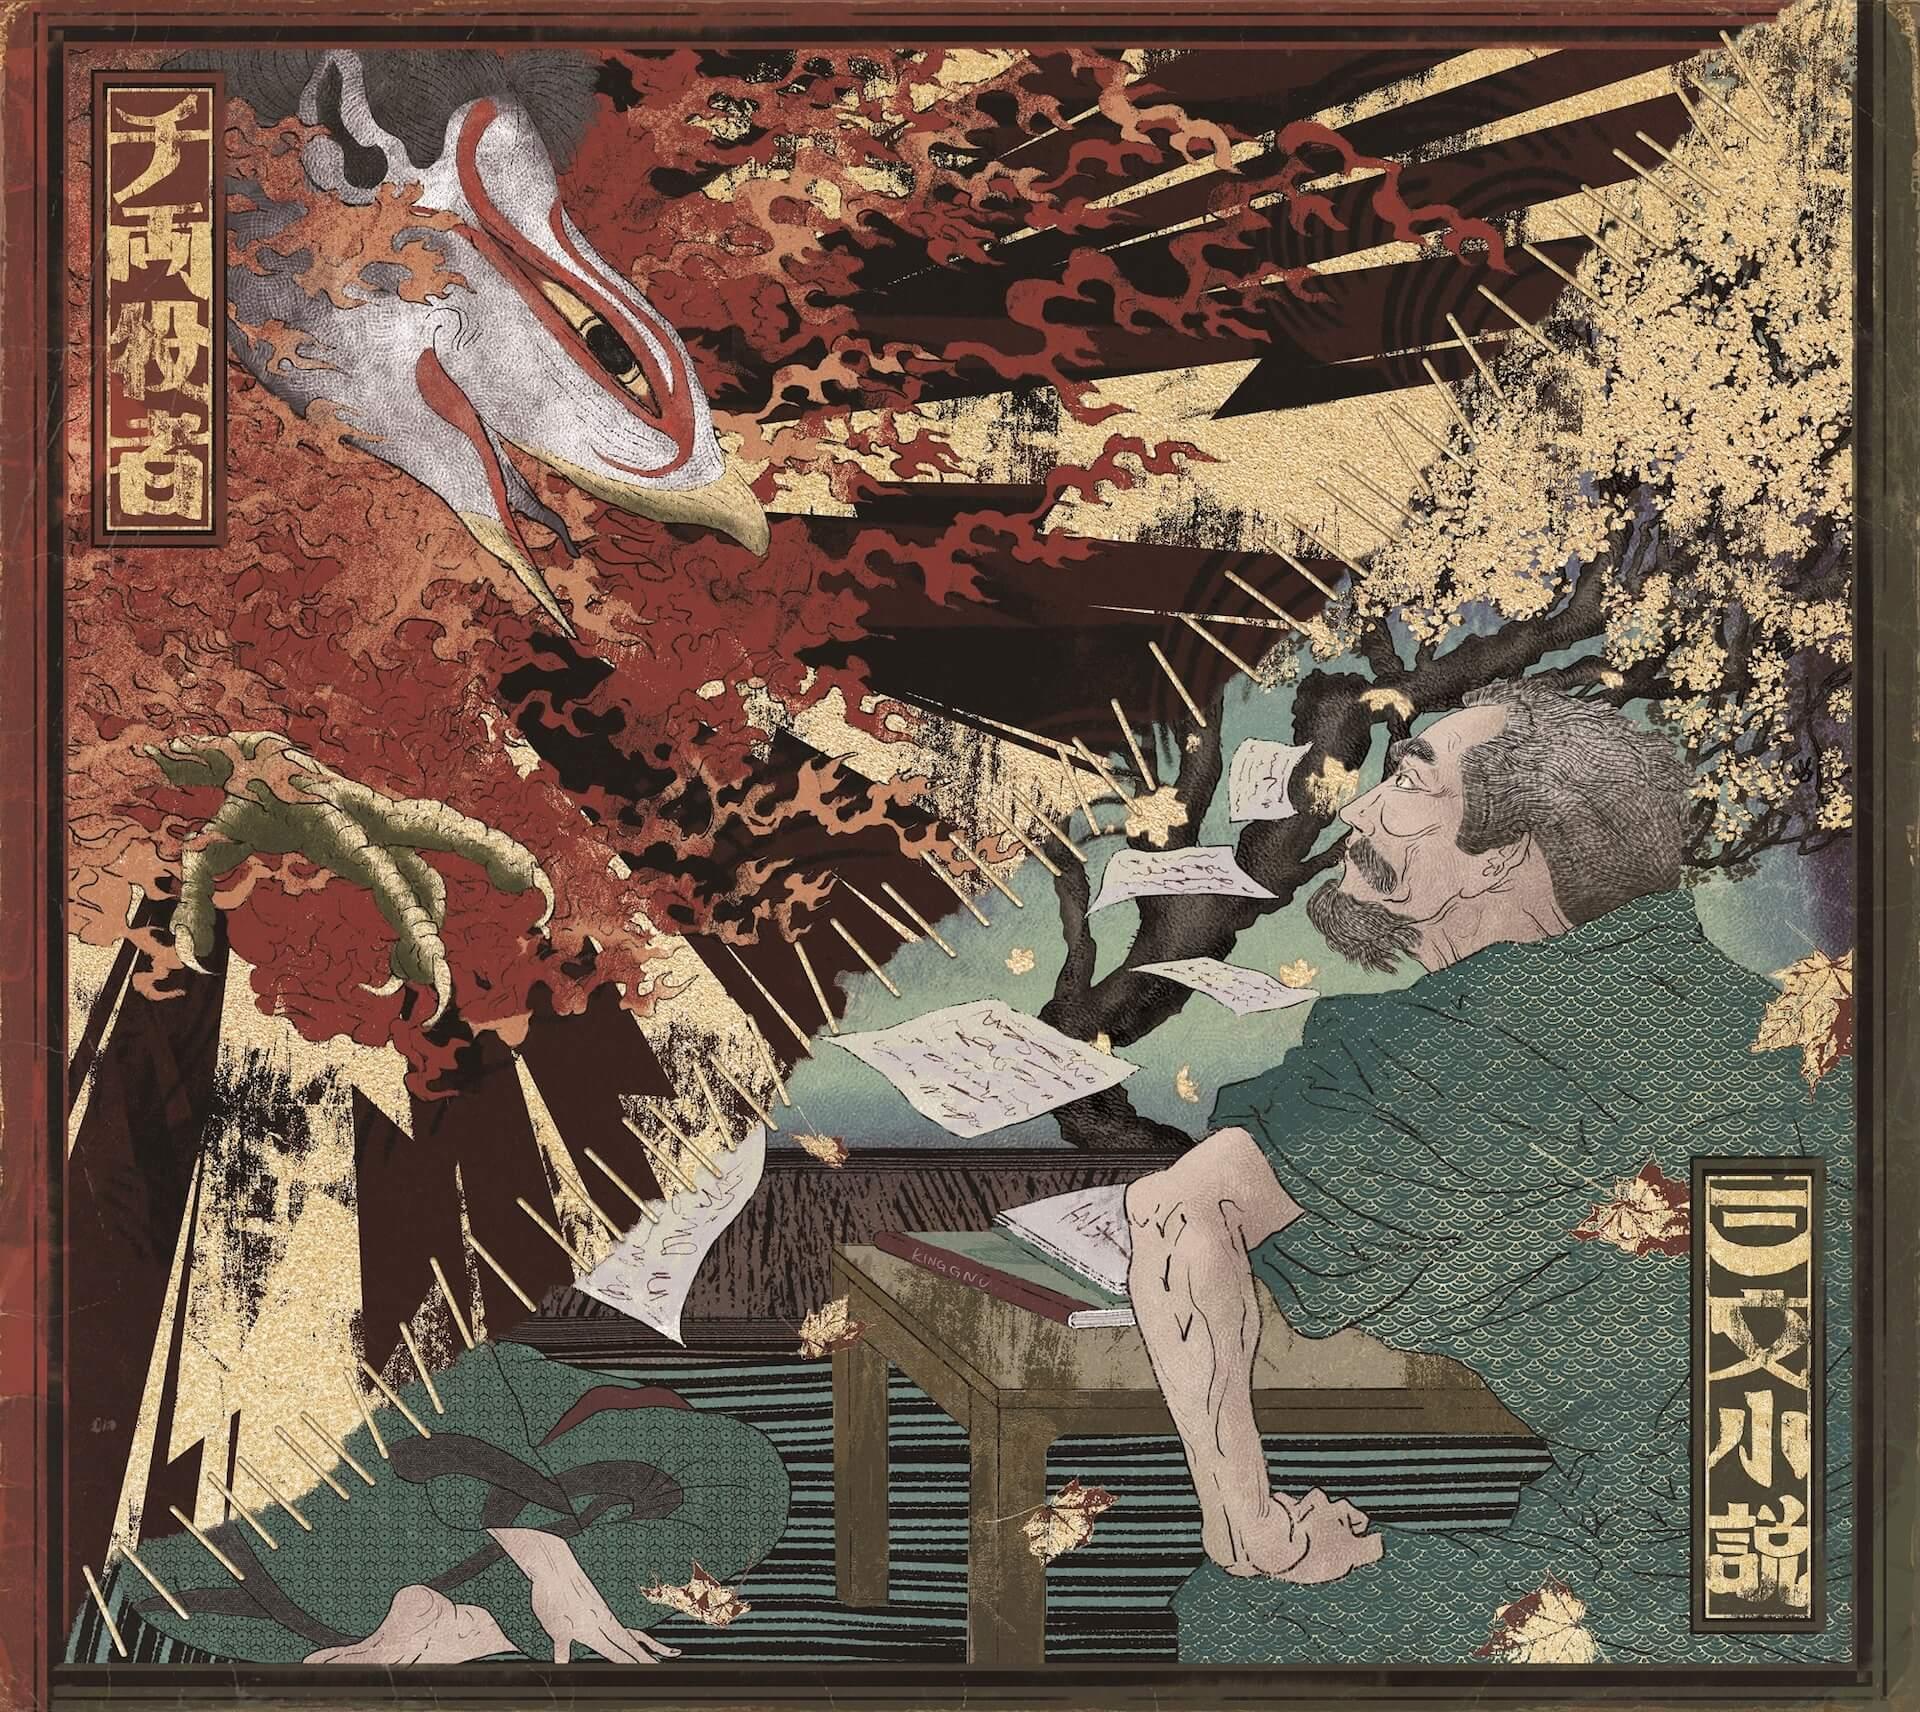 "King Gnuの最新曲""三文小説""のミュージックビデオが明日プレミア公開決定!PERIMETRON・OSRINからのコメントも到着 music201105_kinggnu_main"